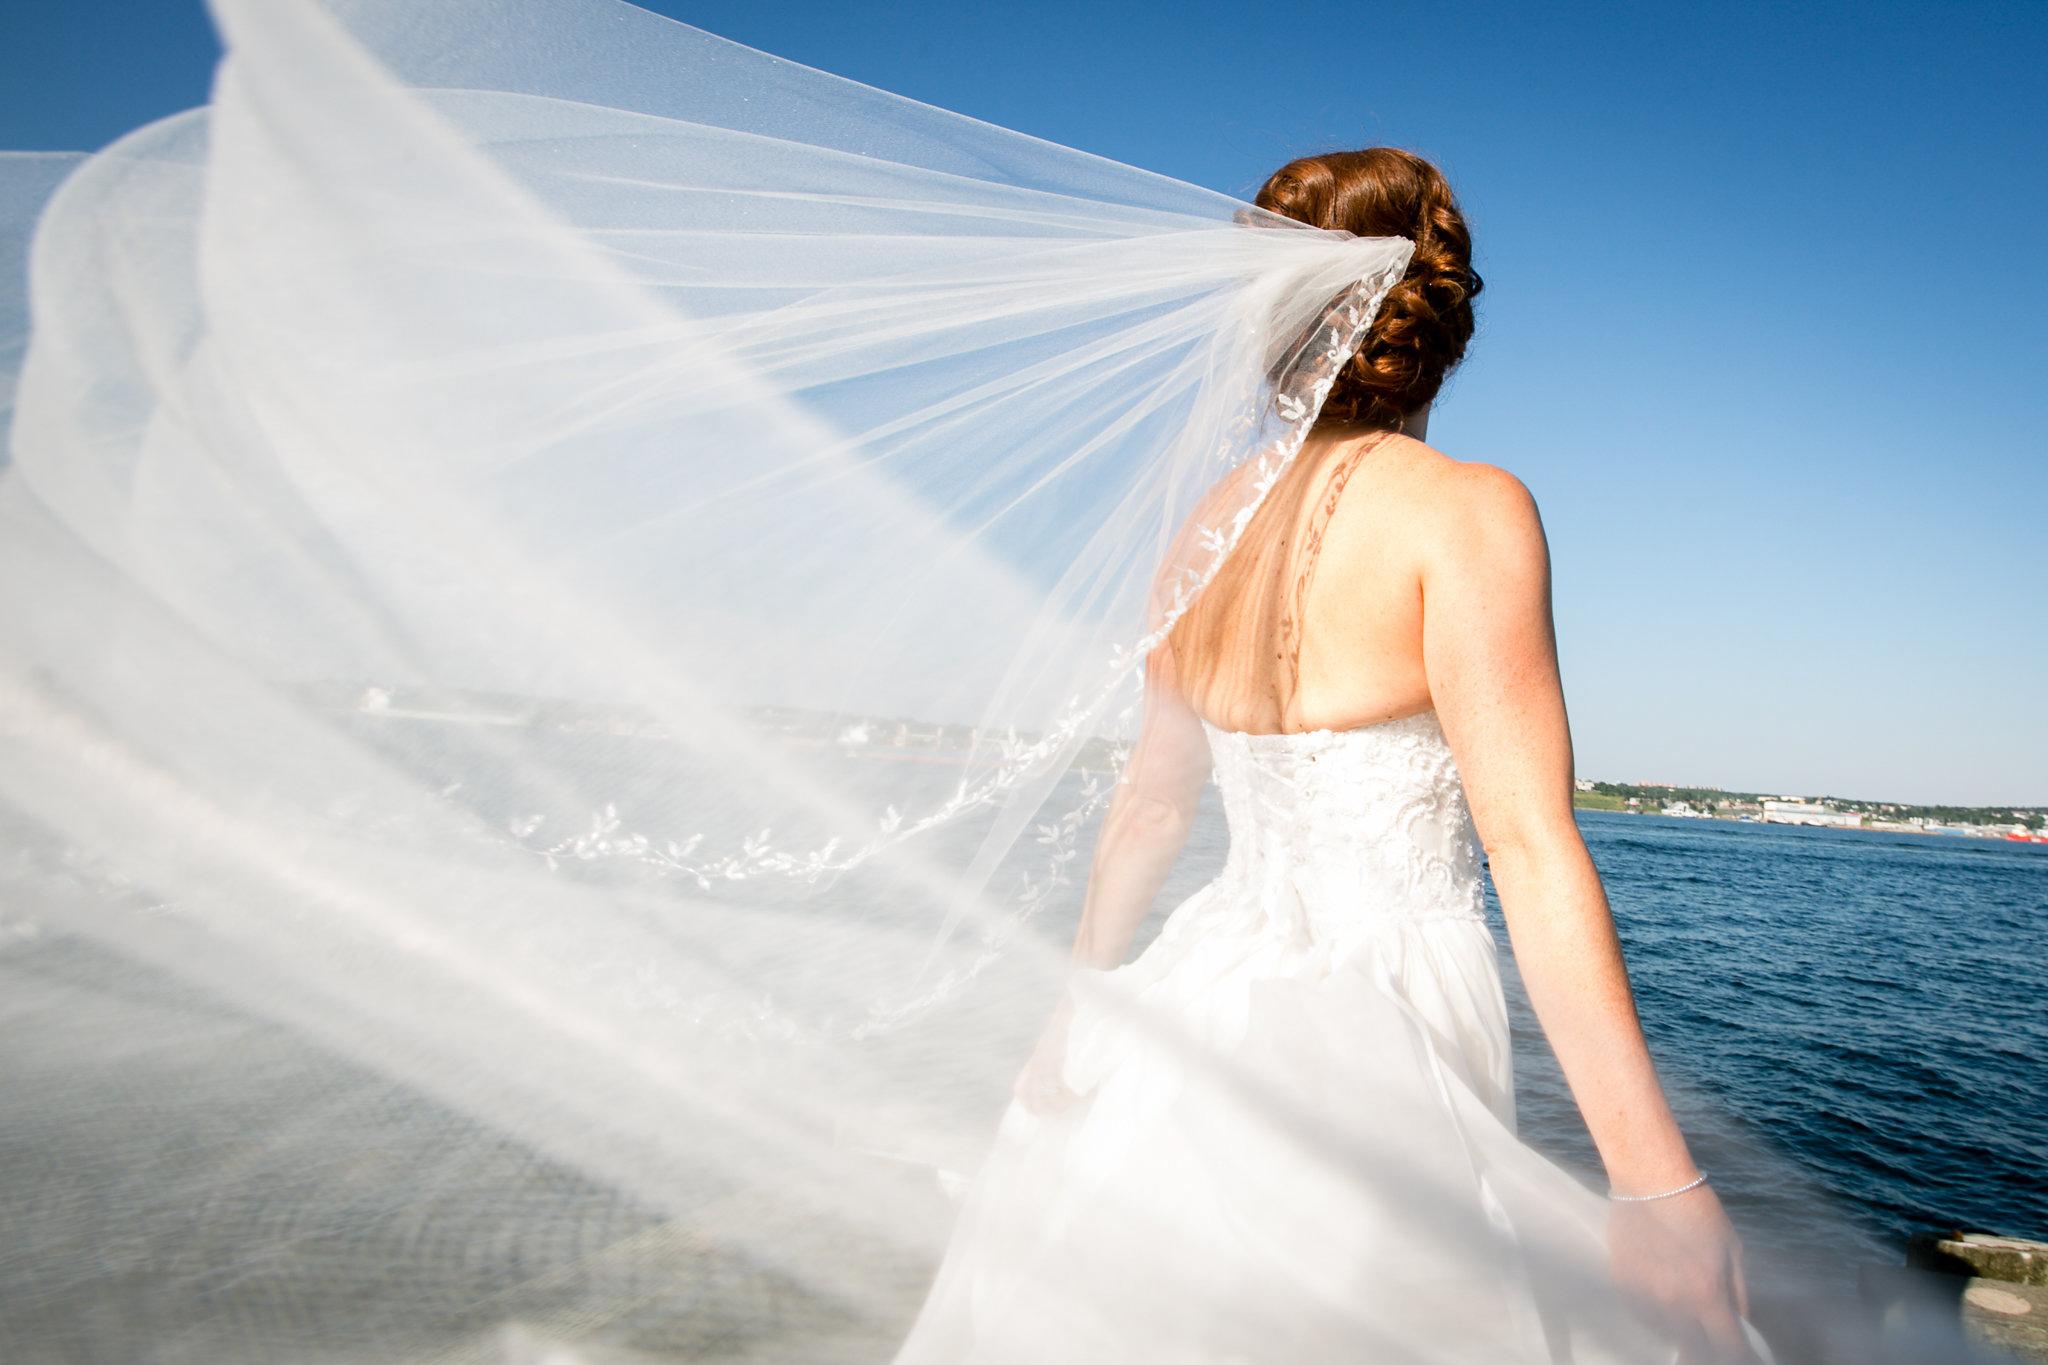 129-steph-mackinnon-WEDDING.jpg